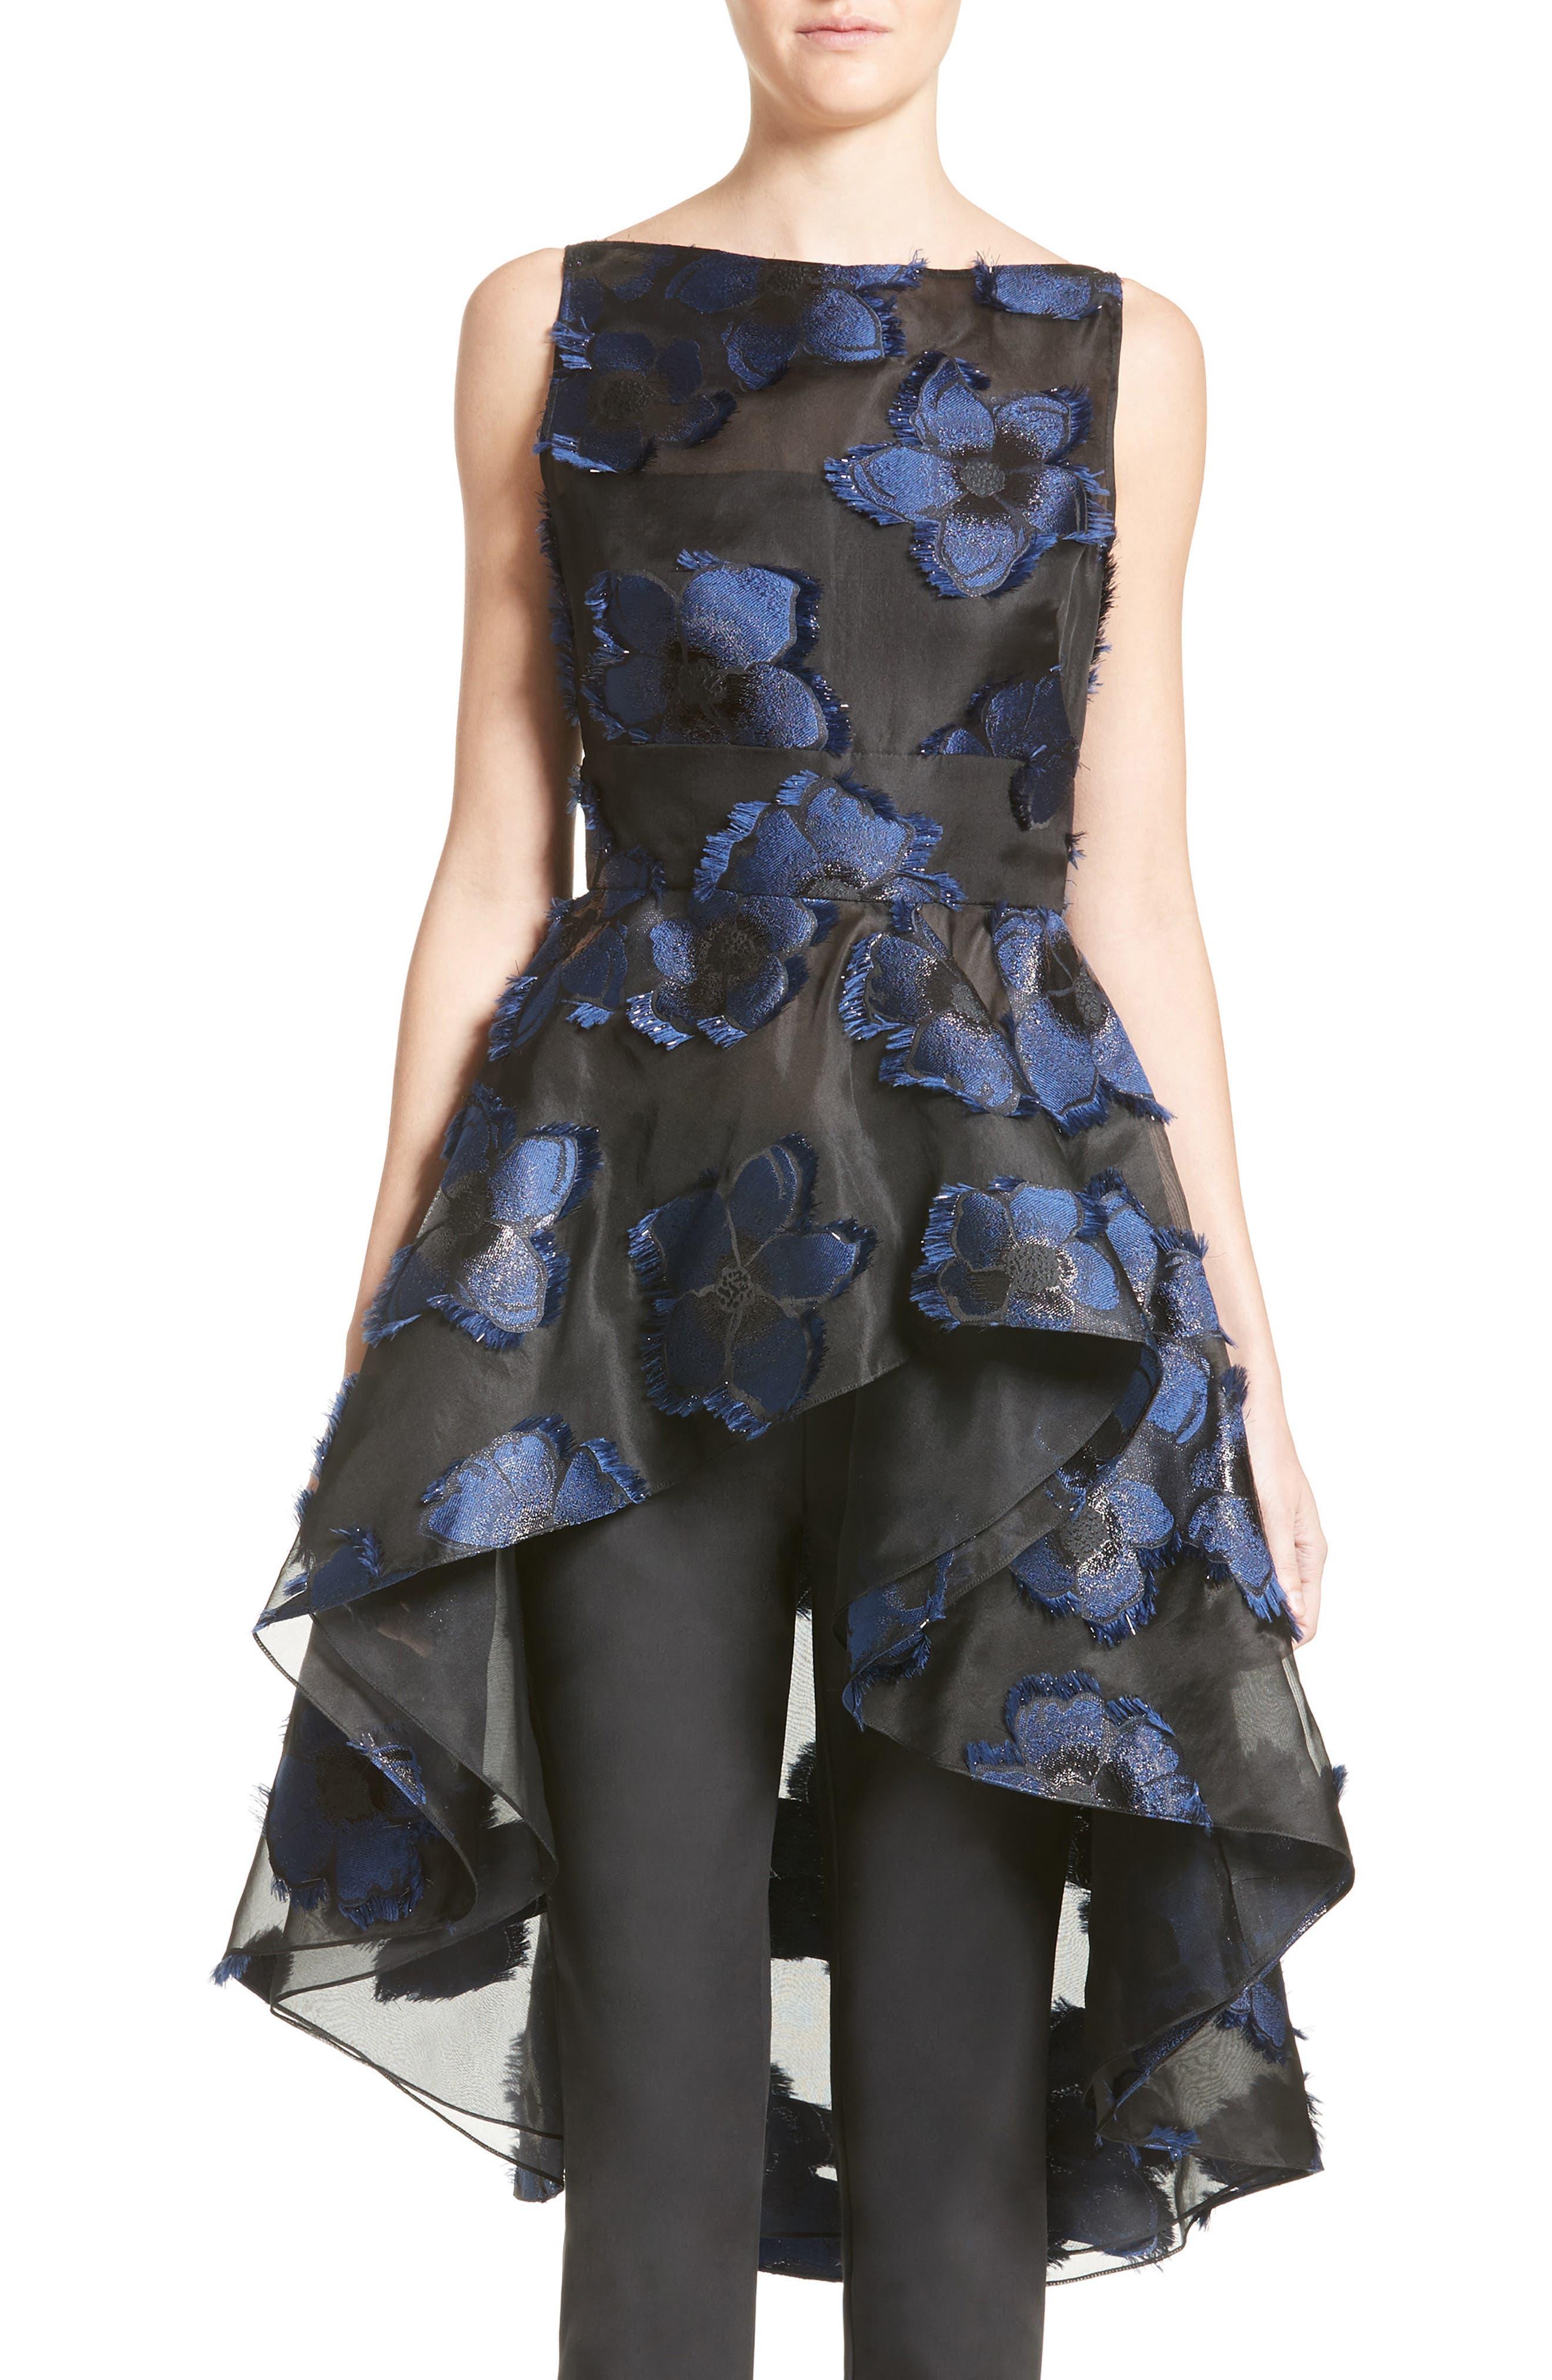 Alternate Image 1 Selected - Lela Rose Metallic Floral Fil Coupé Top